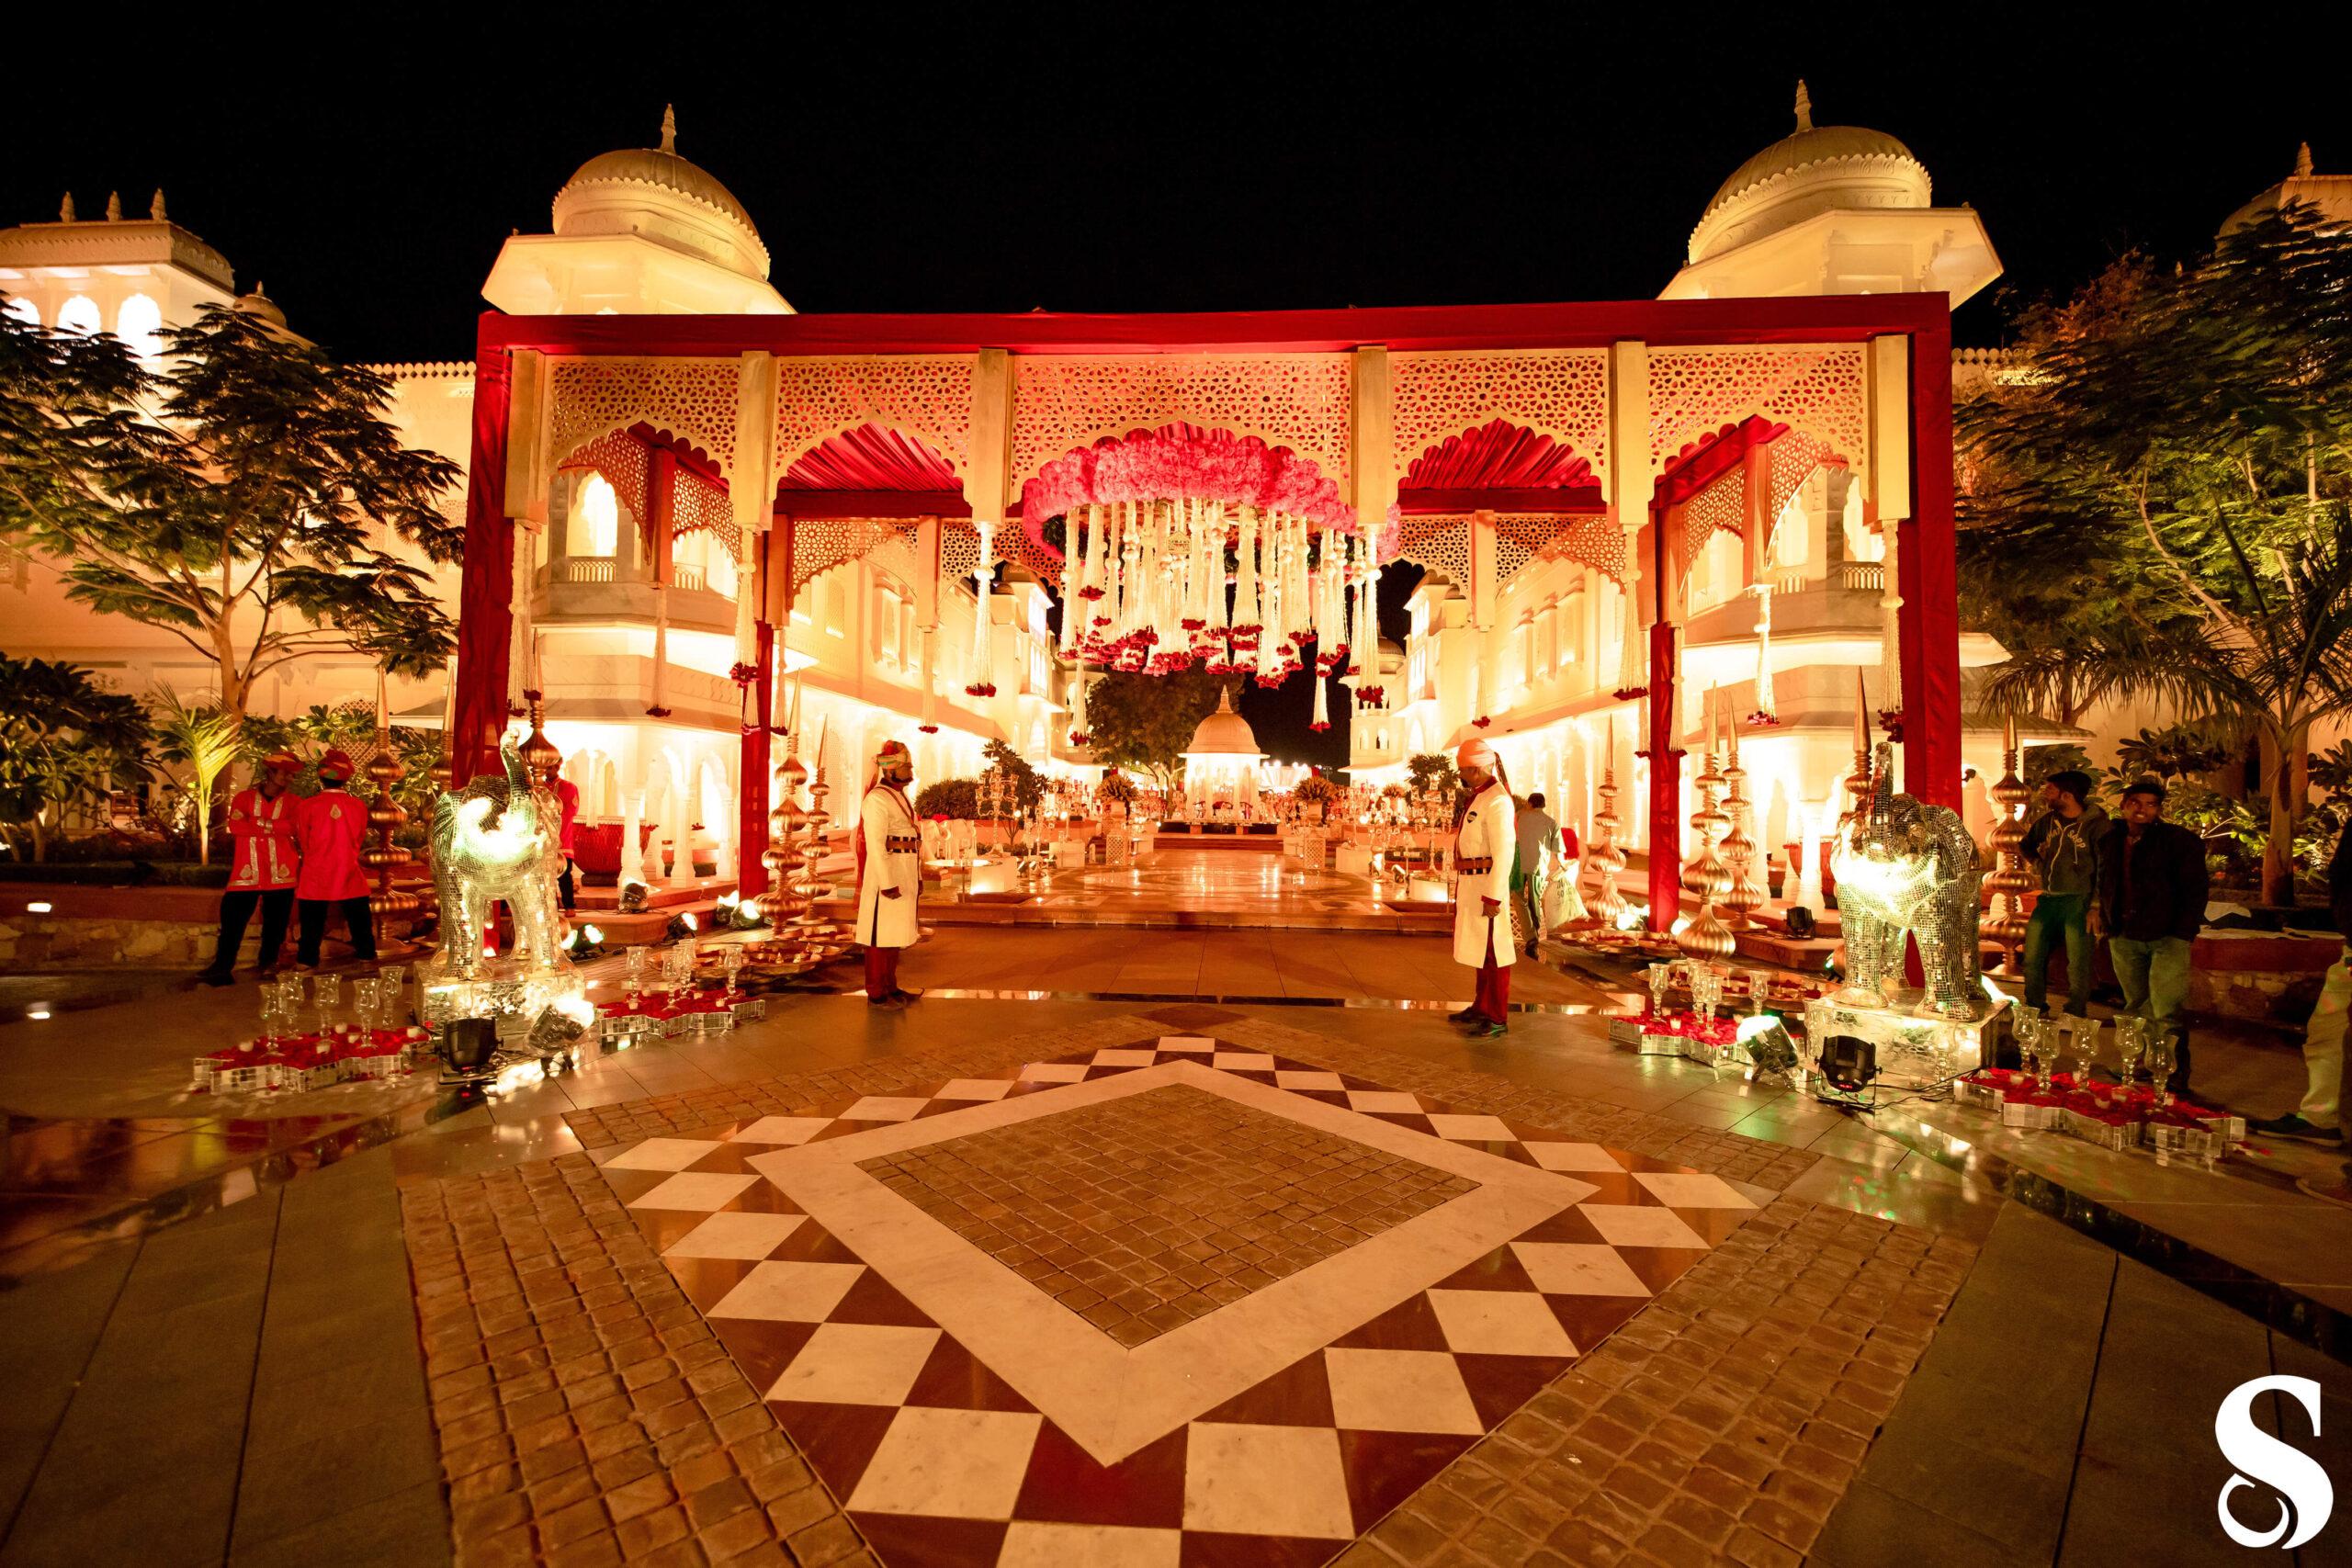 Aditi weds Gaurav (10)